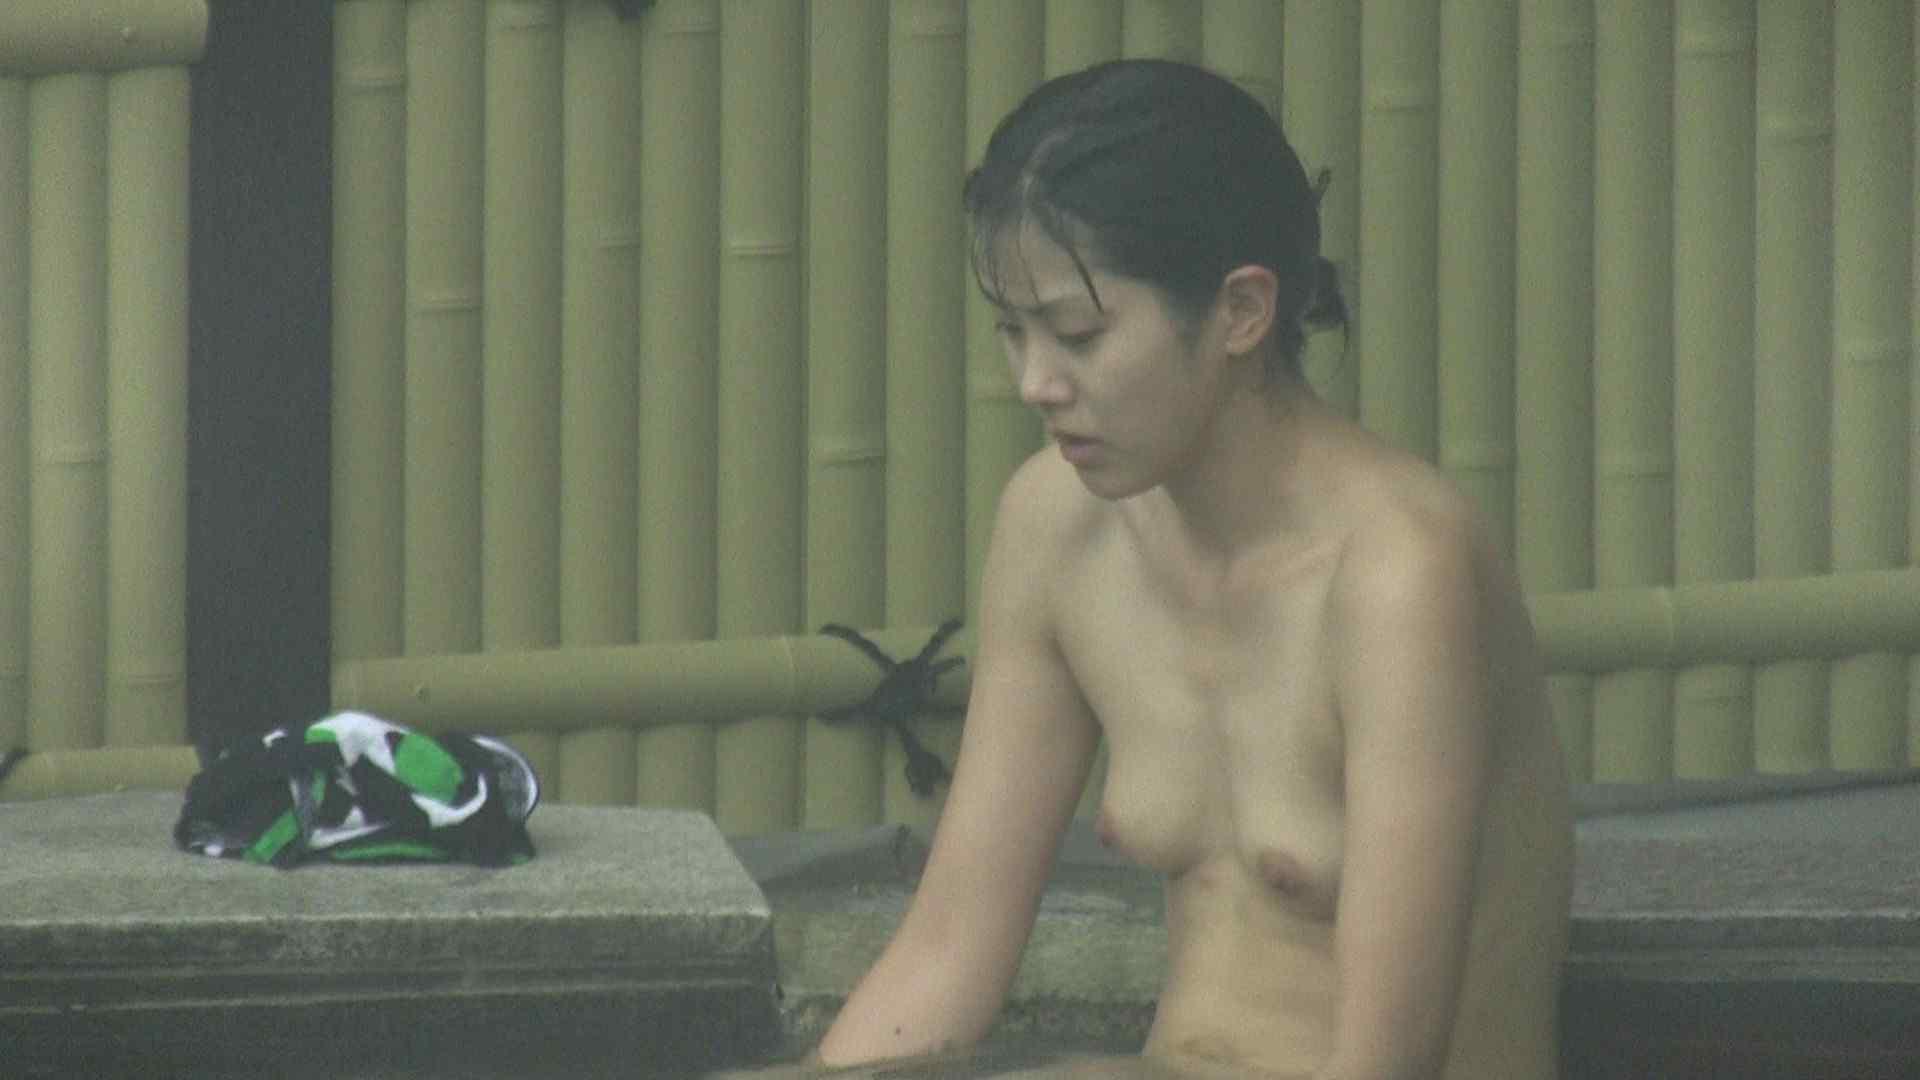 Aquaな露天風呂Vol.174 いやらしいOL | 0  97連発 9